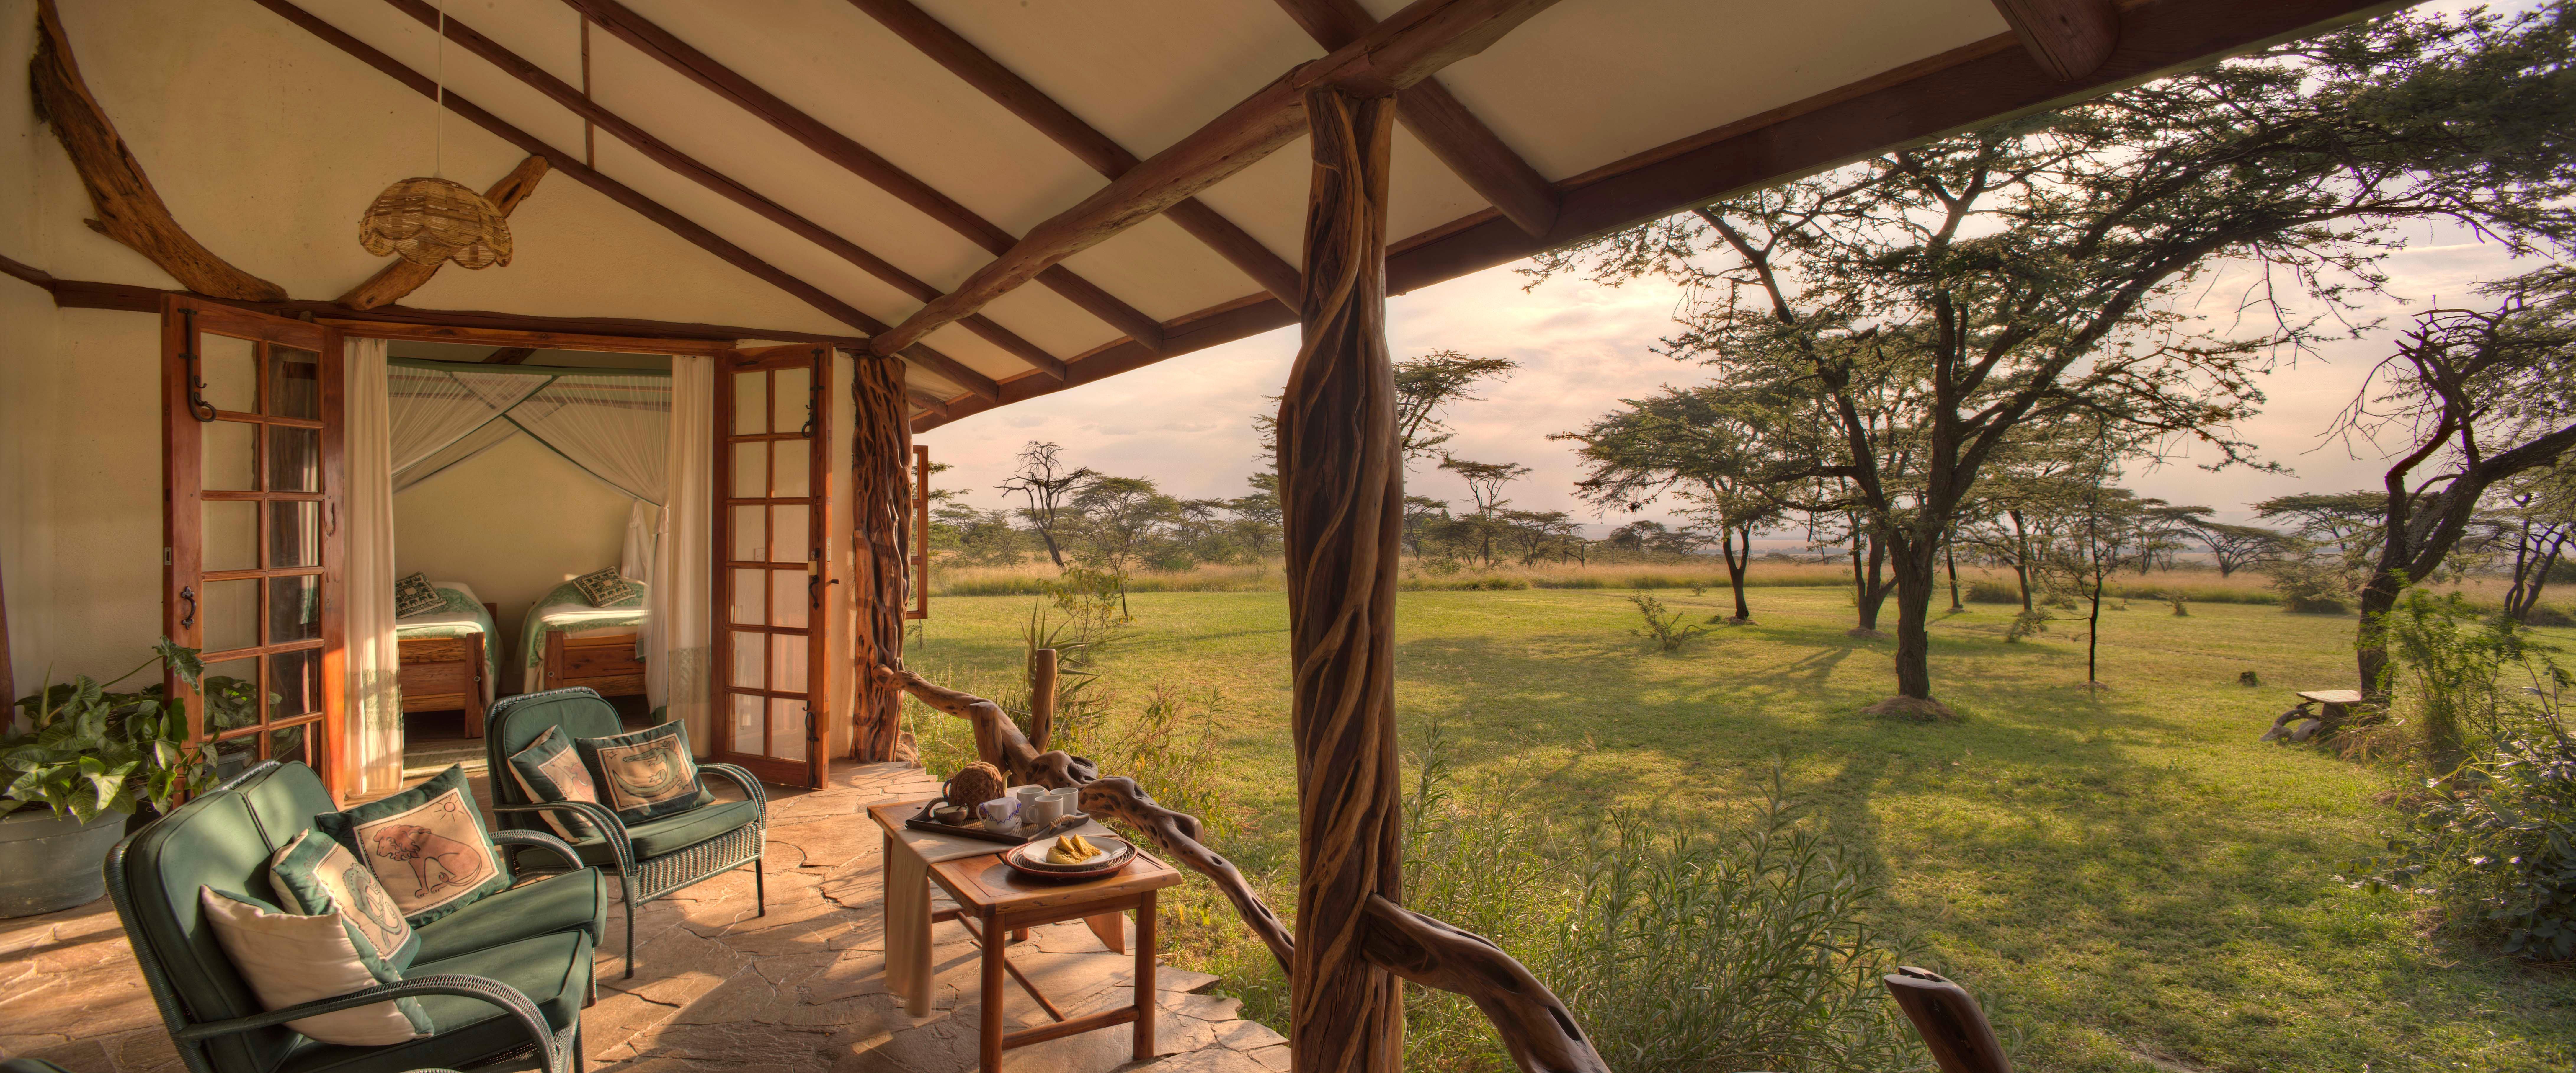 Mara Bush Houses, Asilia Africa